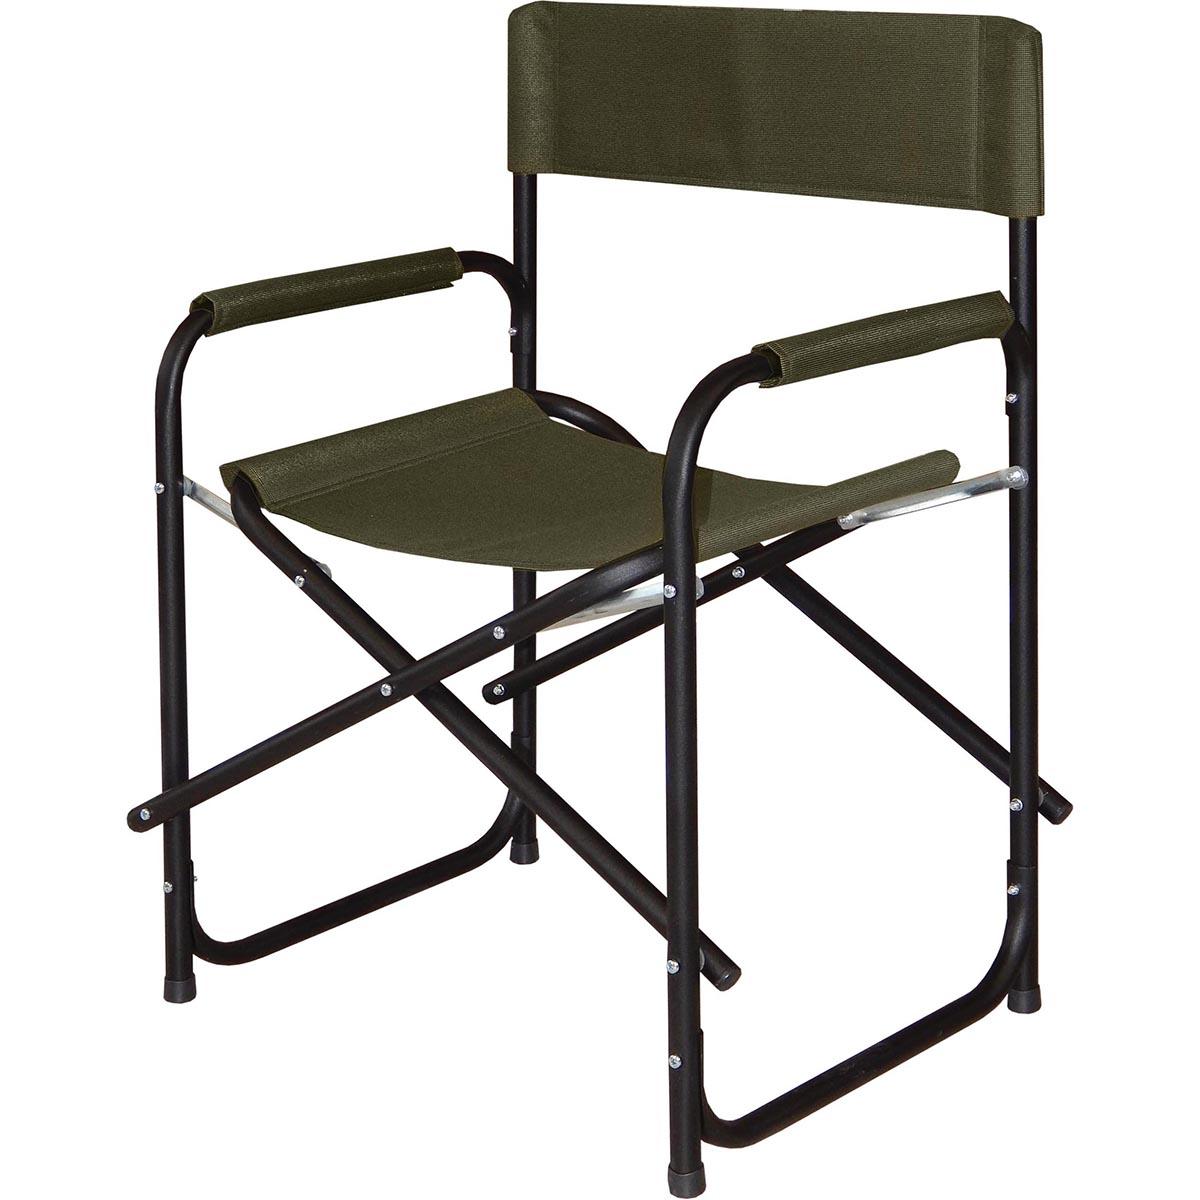 Стул складной Greenell  FC-17 R22 , цвет: хаки, 58 х 46 х 47(82) см - Складная и надувная мебель